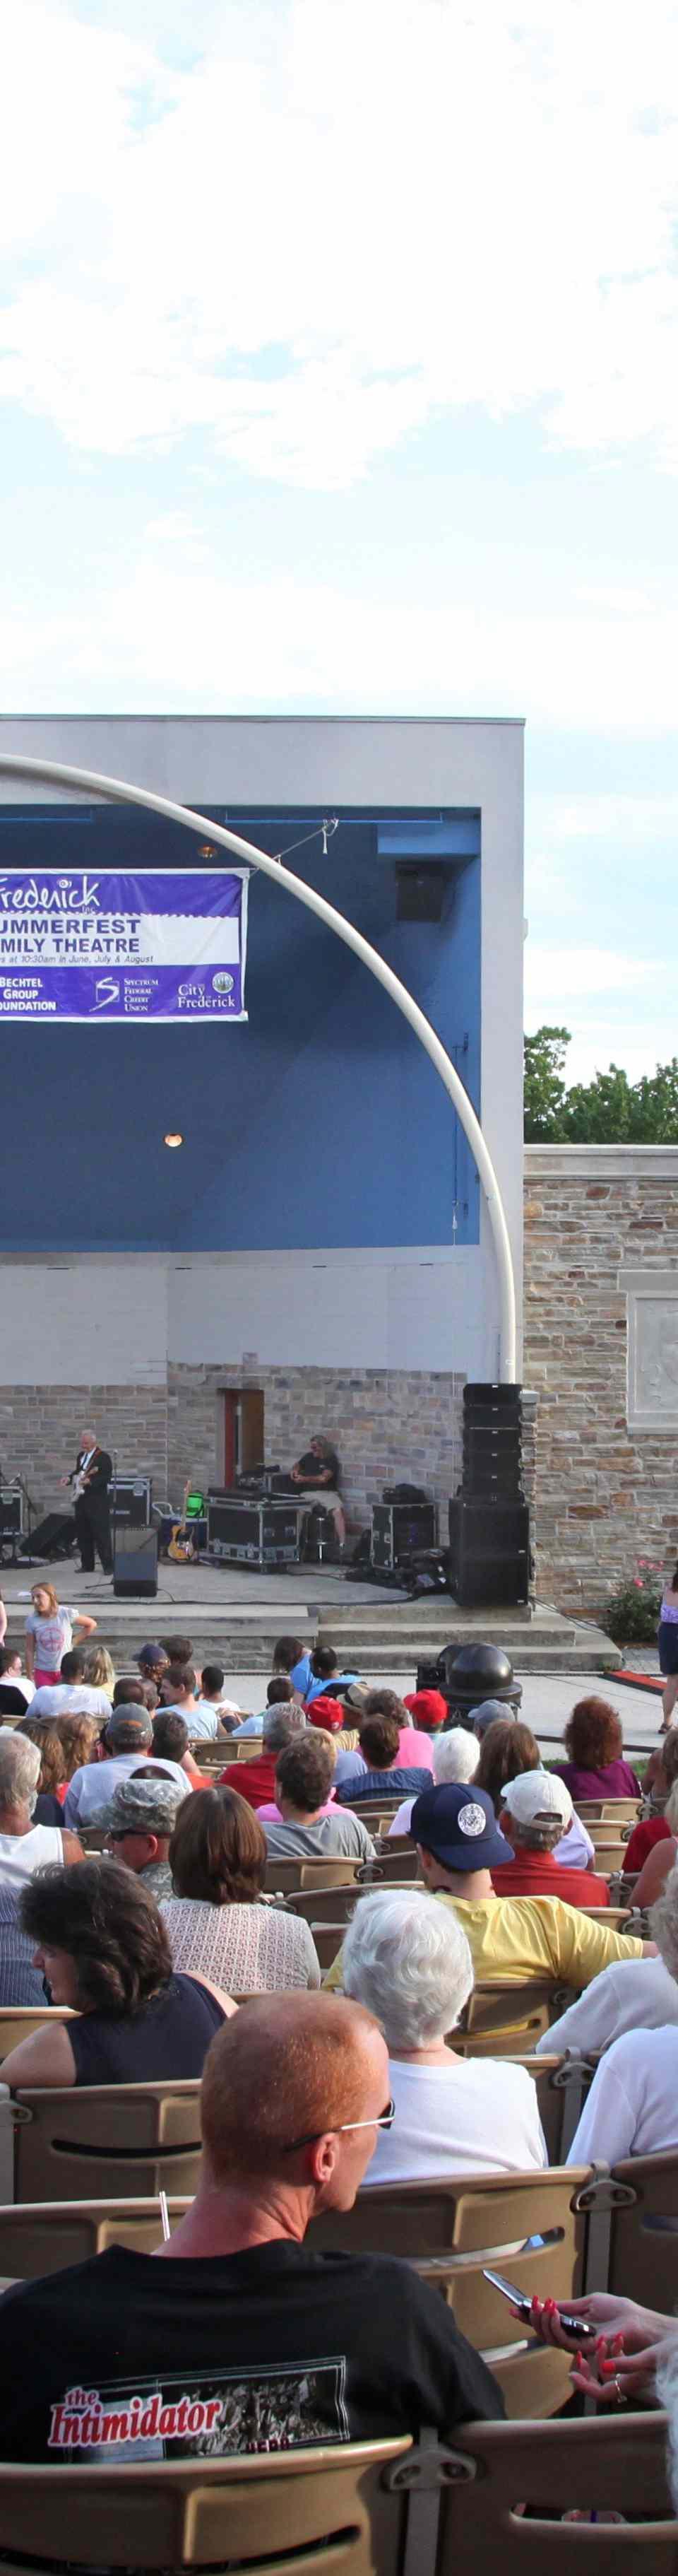 frederick-concerts.jpg